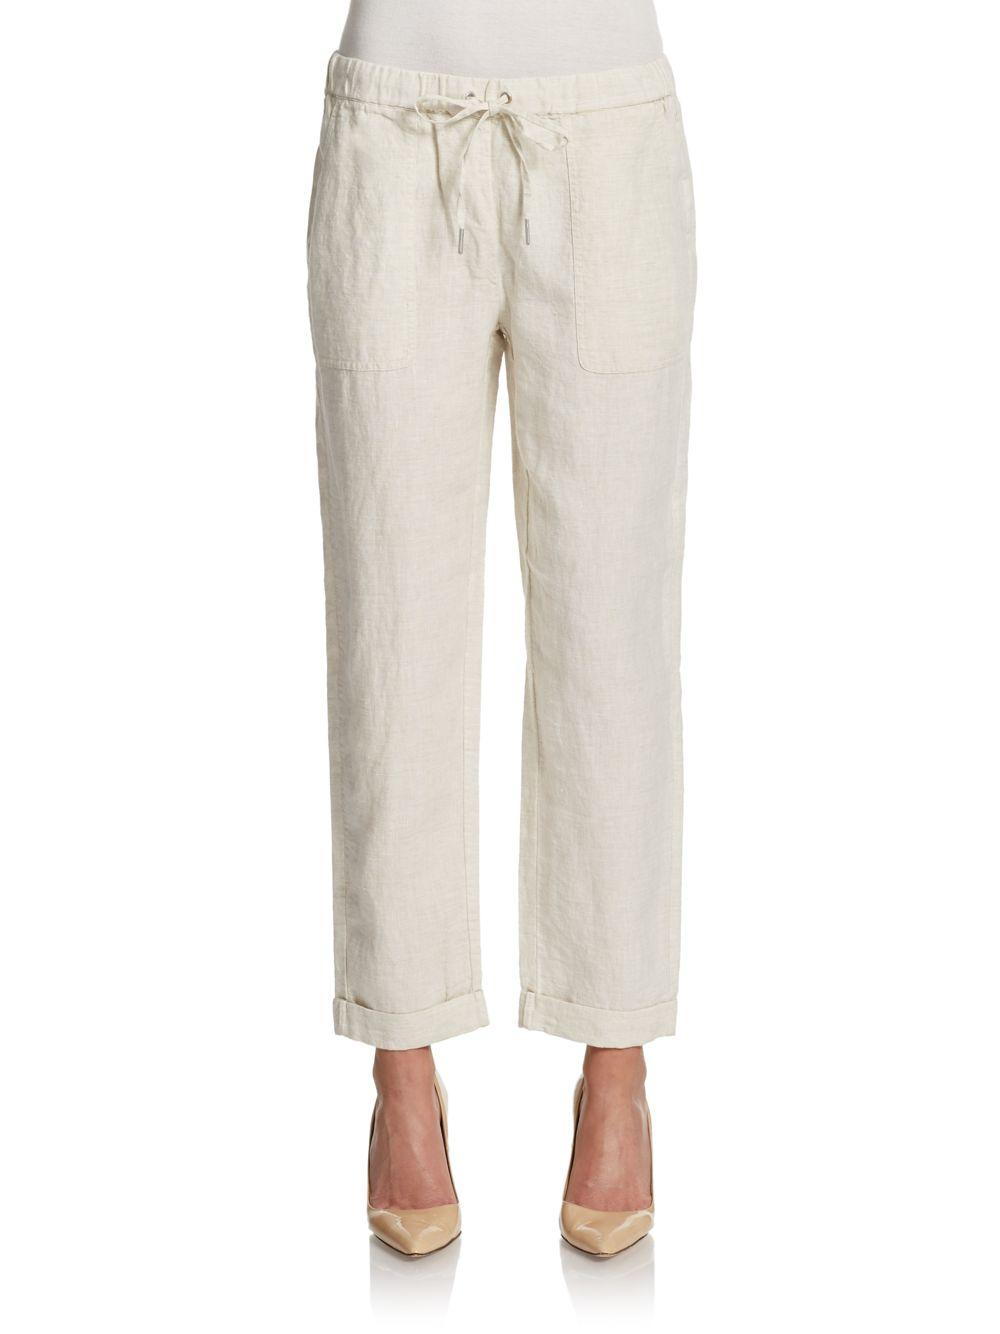 Cheap Black Khaki Pants 2017   Pi Pants - Part 278